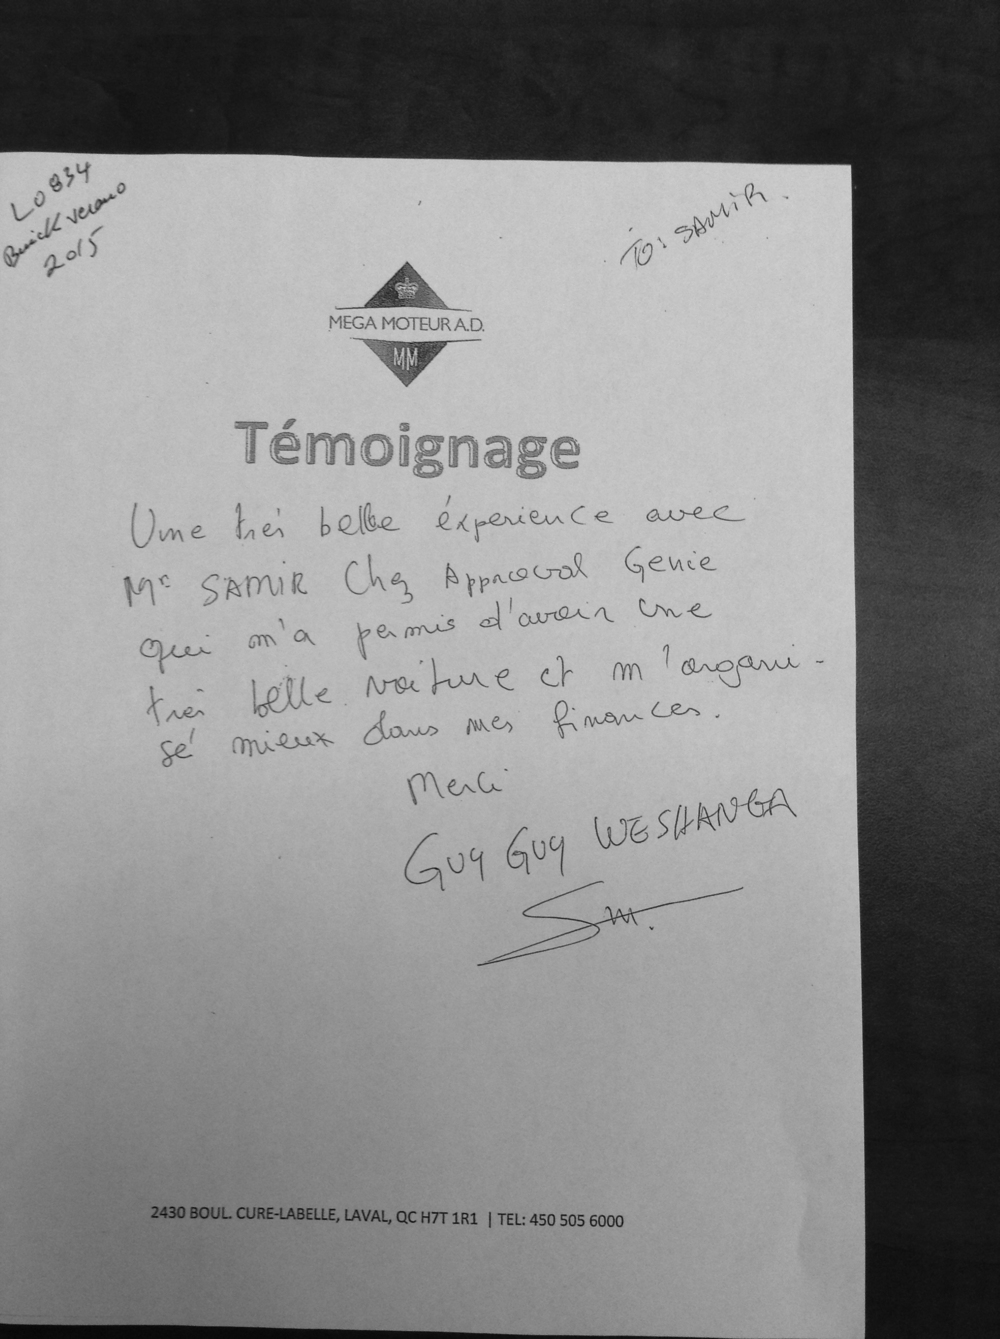 Weshanga_Testimonial.jpg